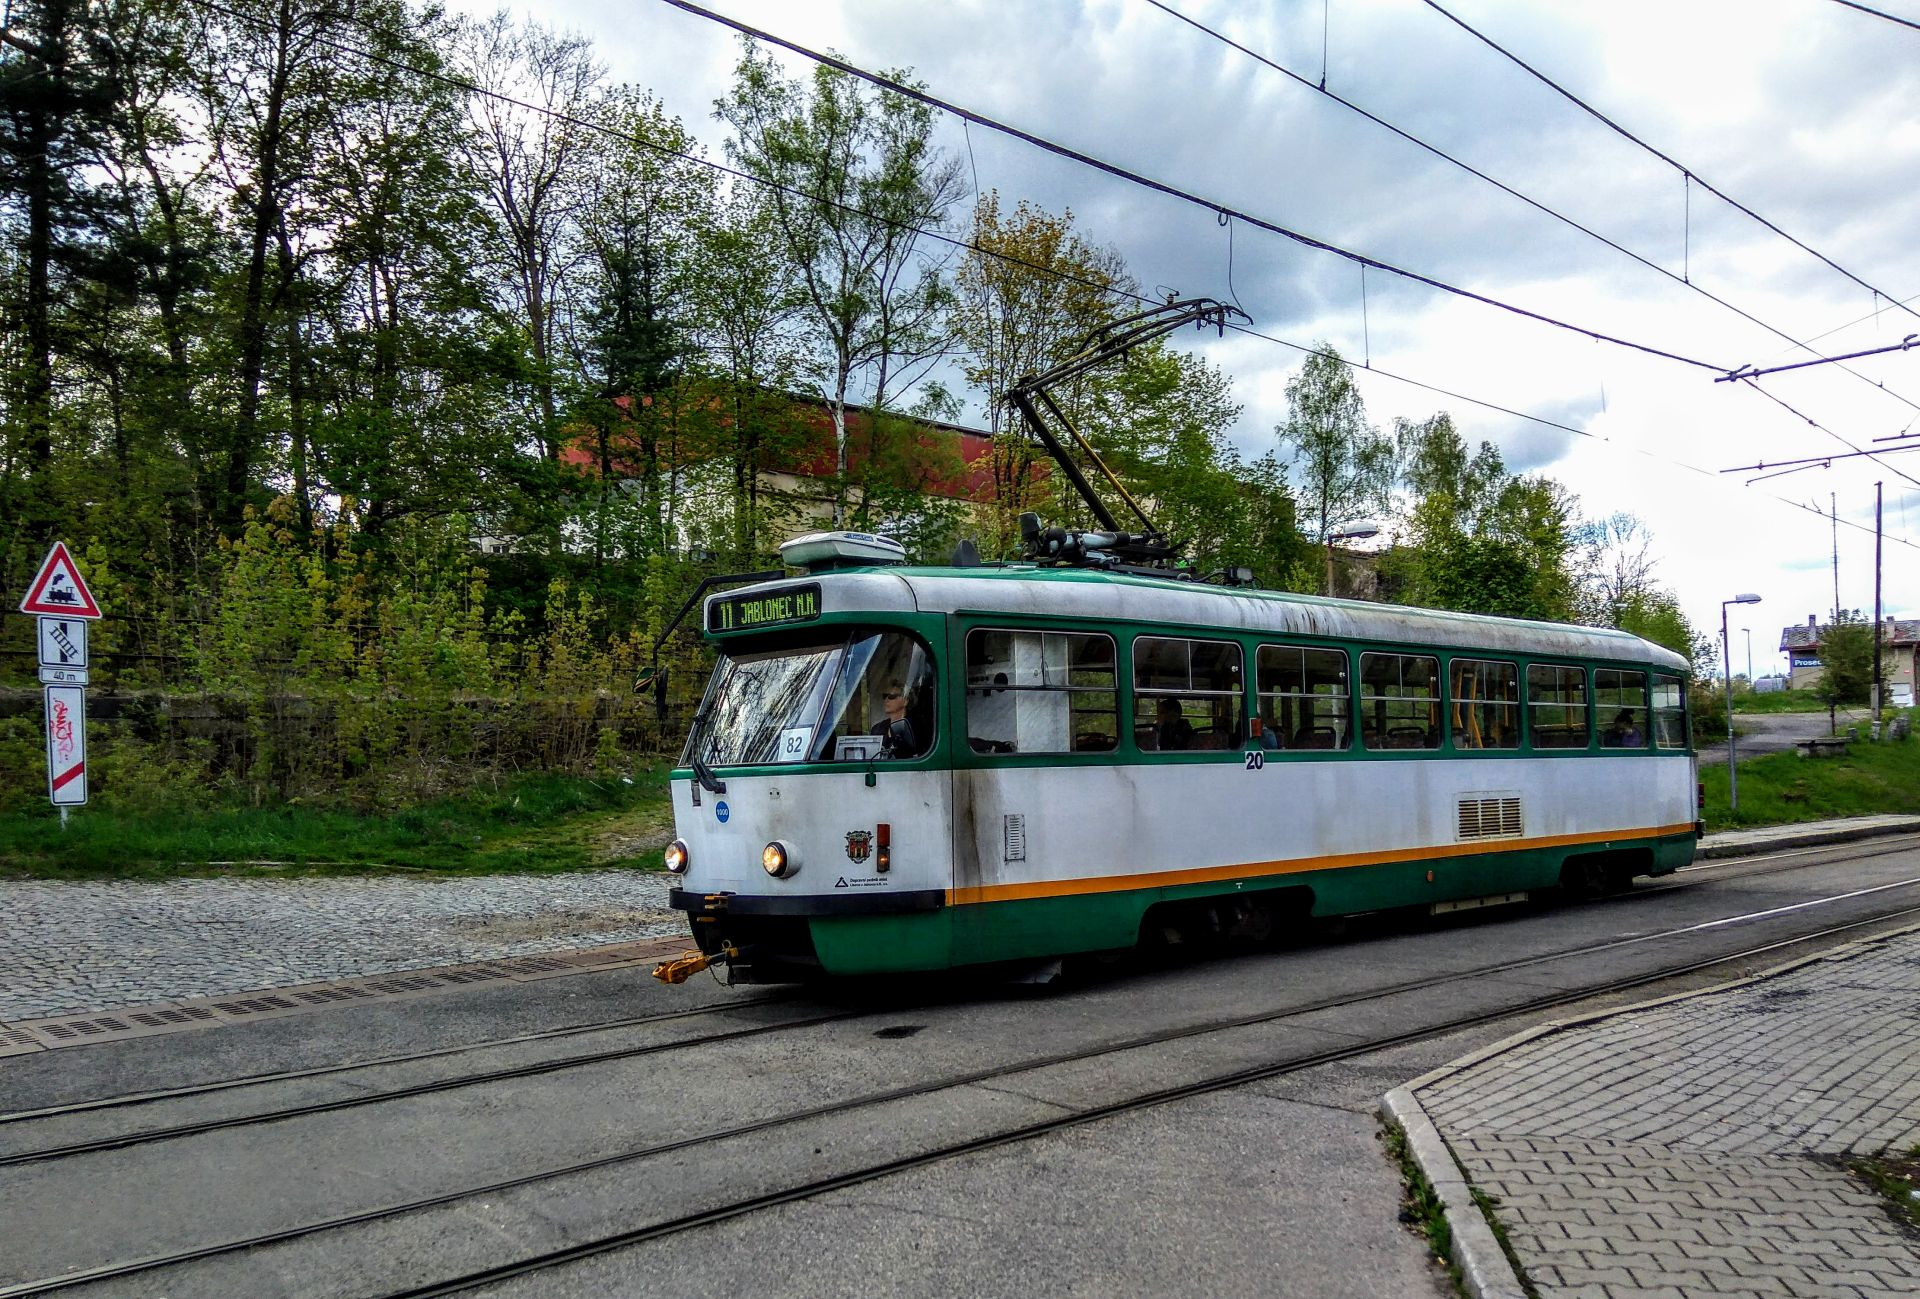 Tramvaj mezi Libercem a Jabloncem v Proseči nad Nisou. Foto: Jan Sůra